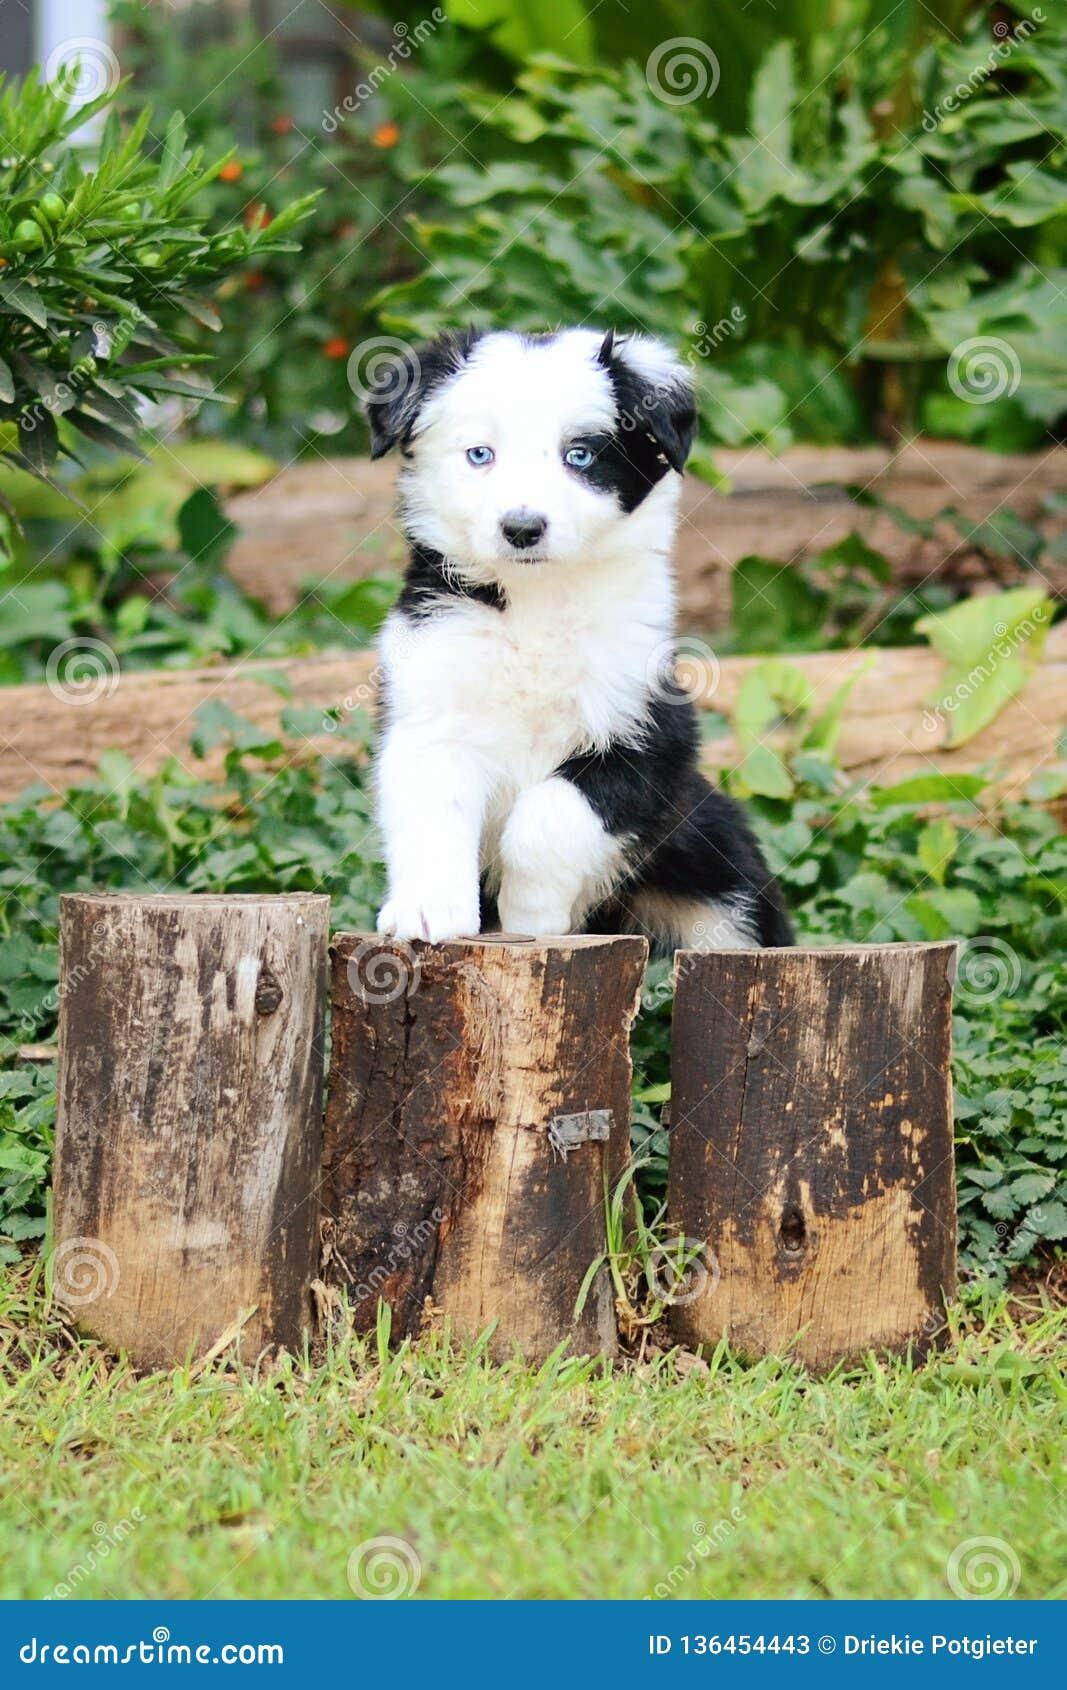 Blue Eye Border Collie Puppy Stock Image Image Of Beautiful Border 136454443